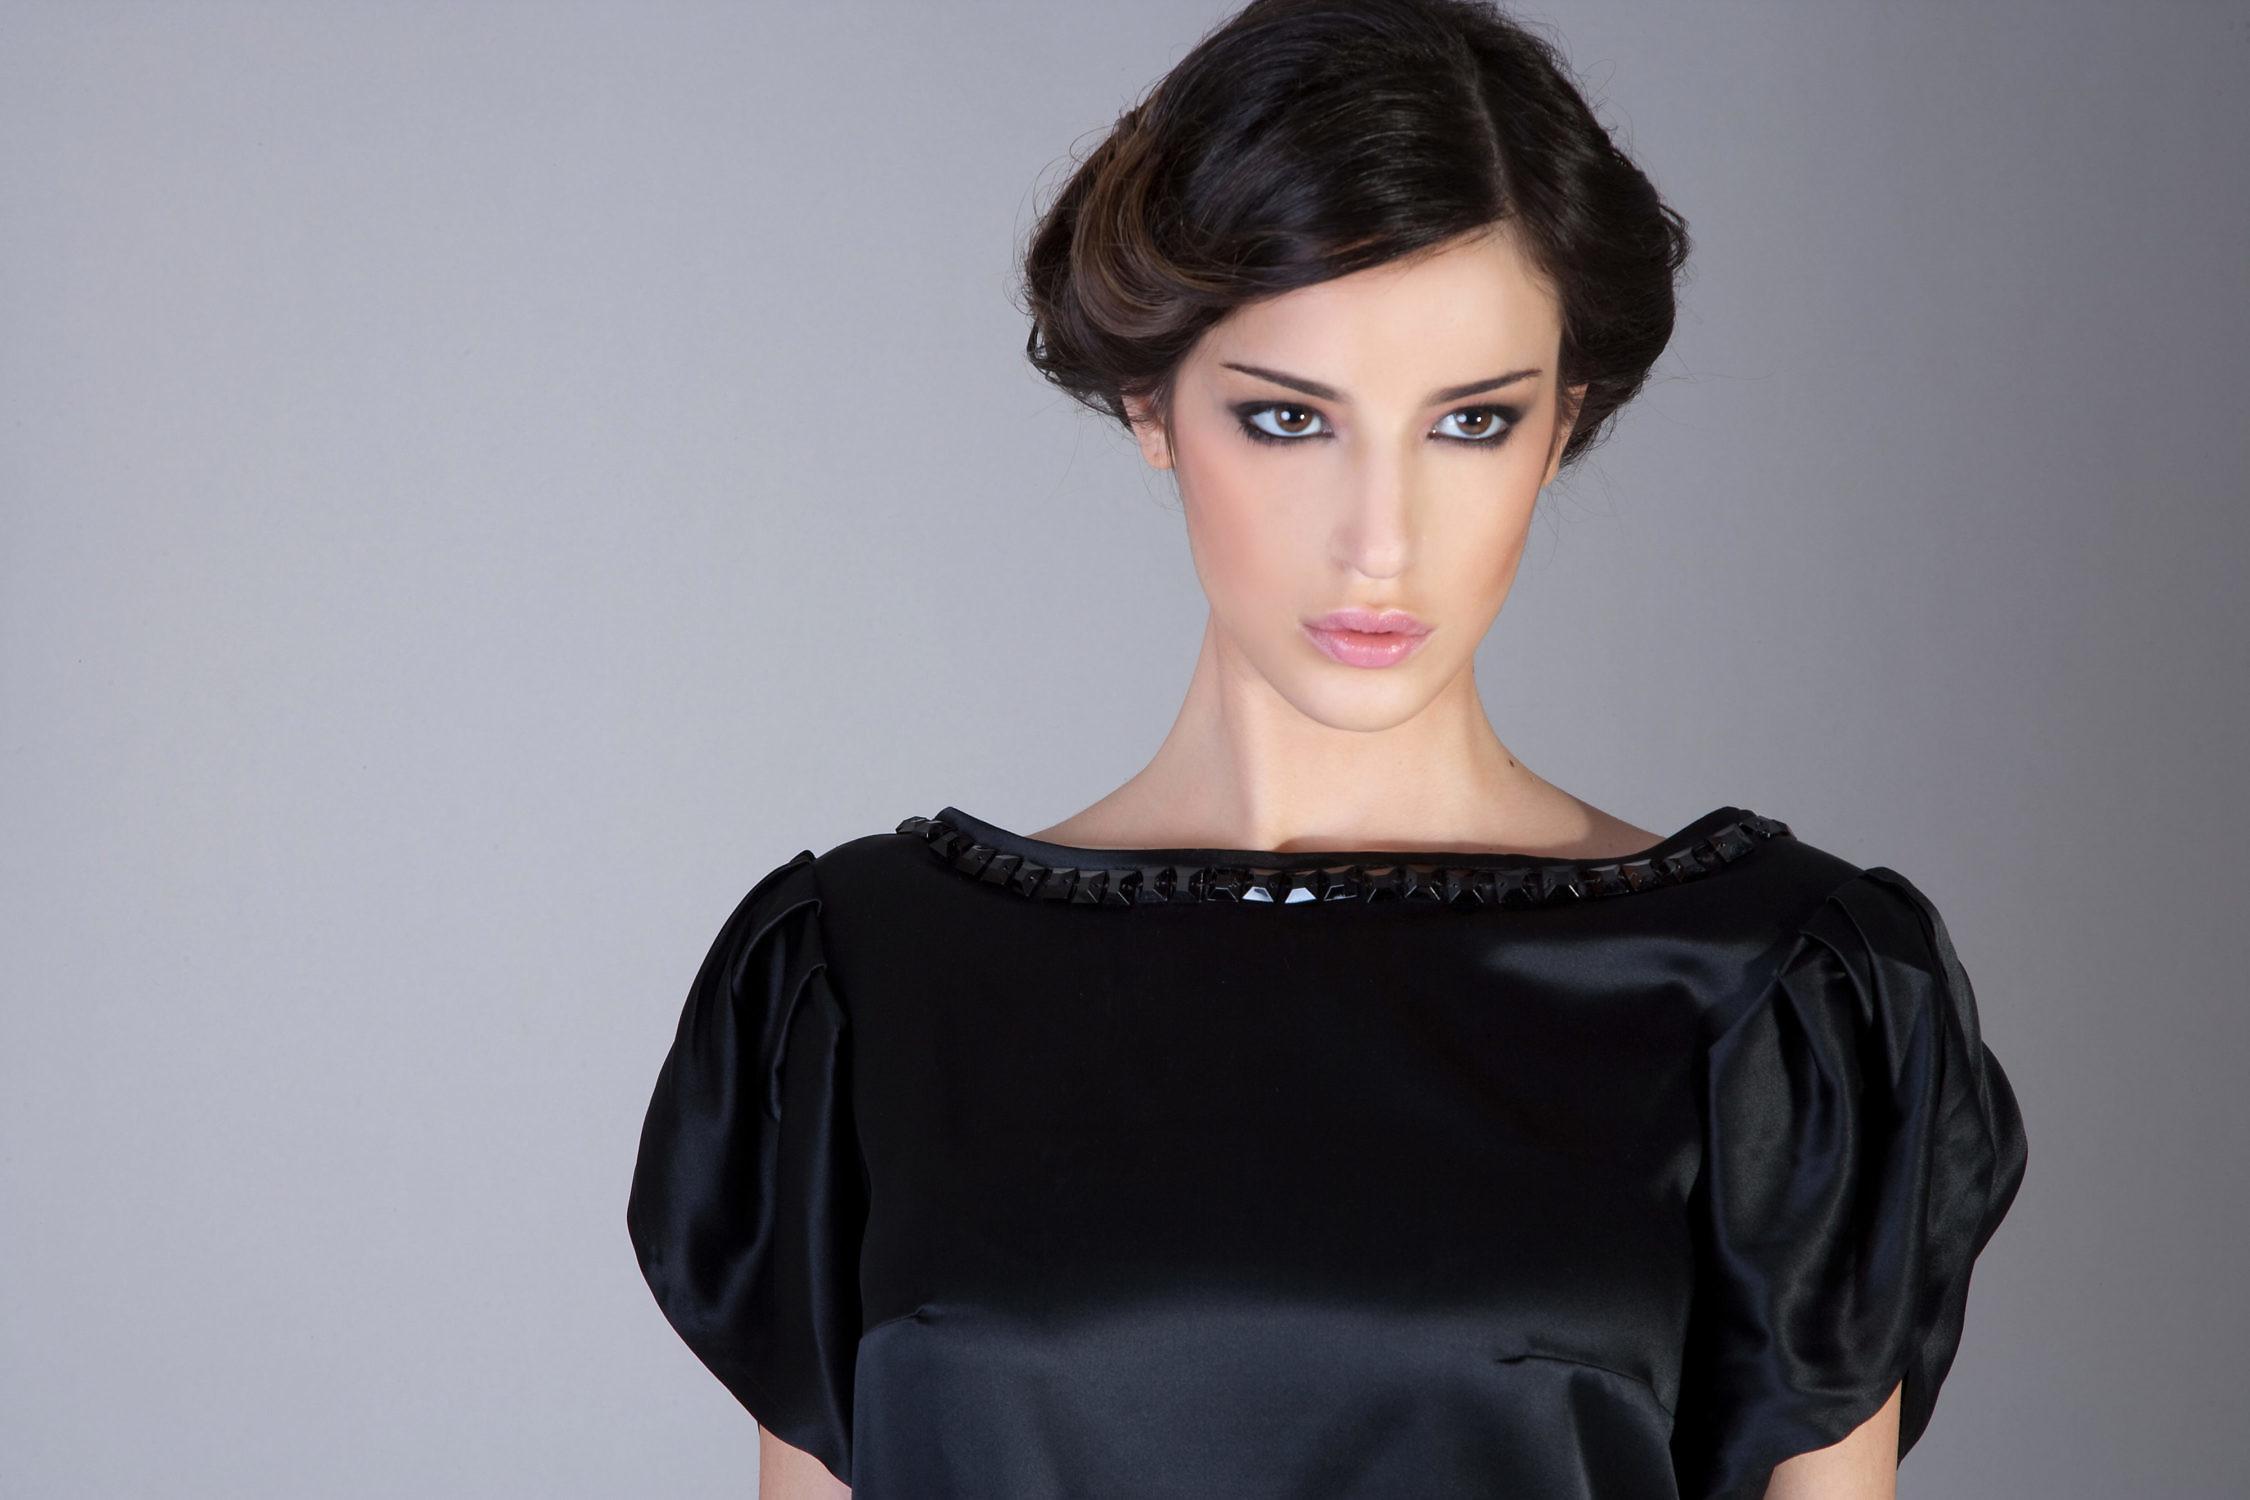 black silk top with rhinestones and cuff sleeves   ASITA SAHABI